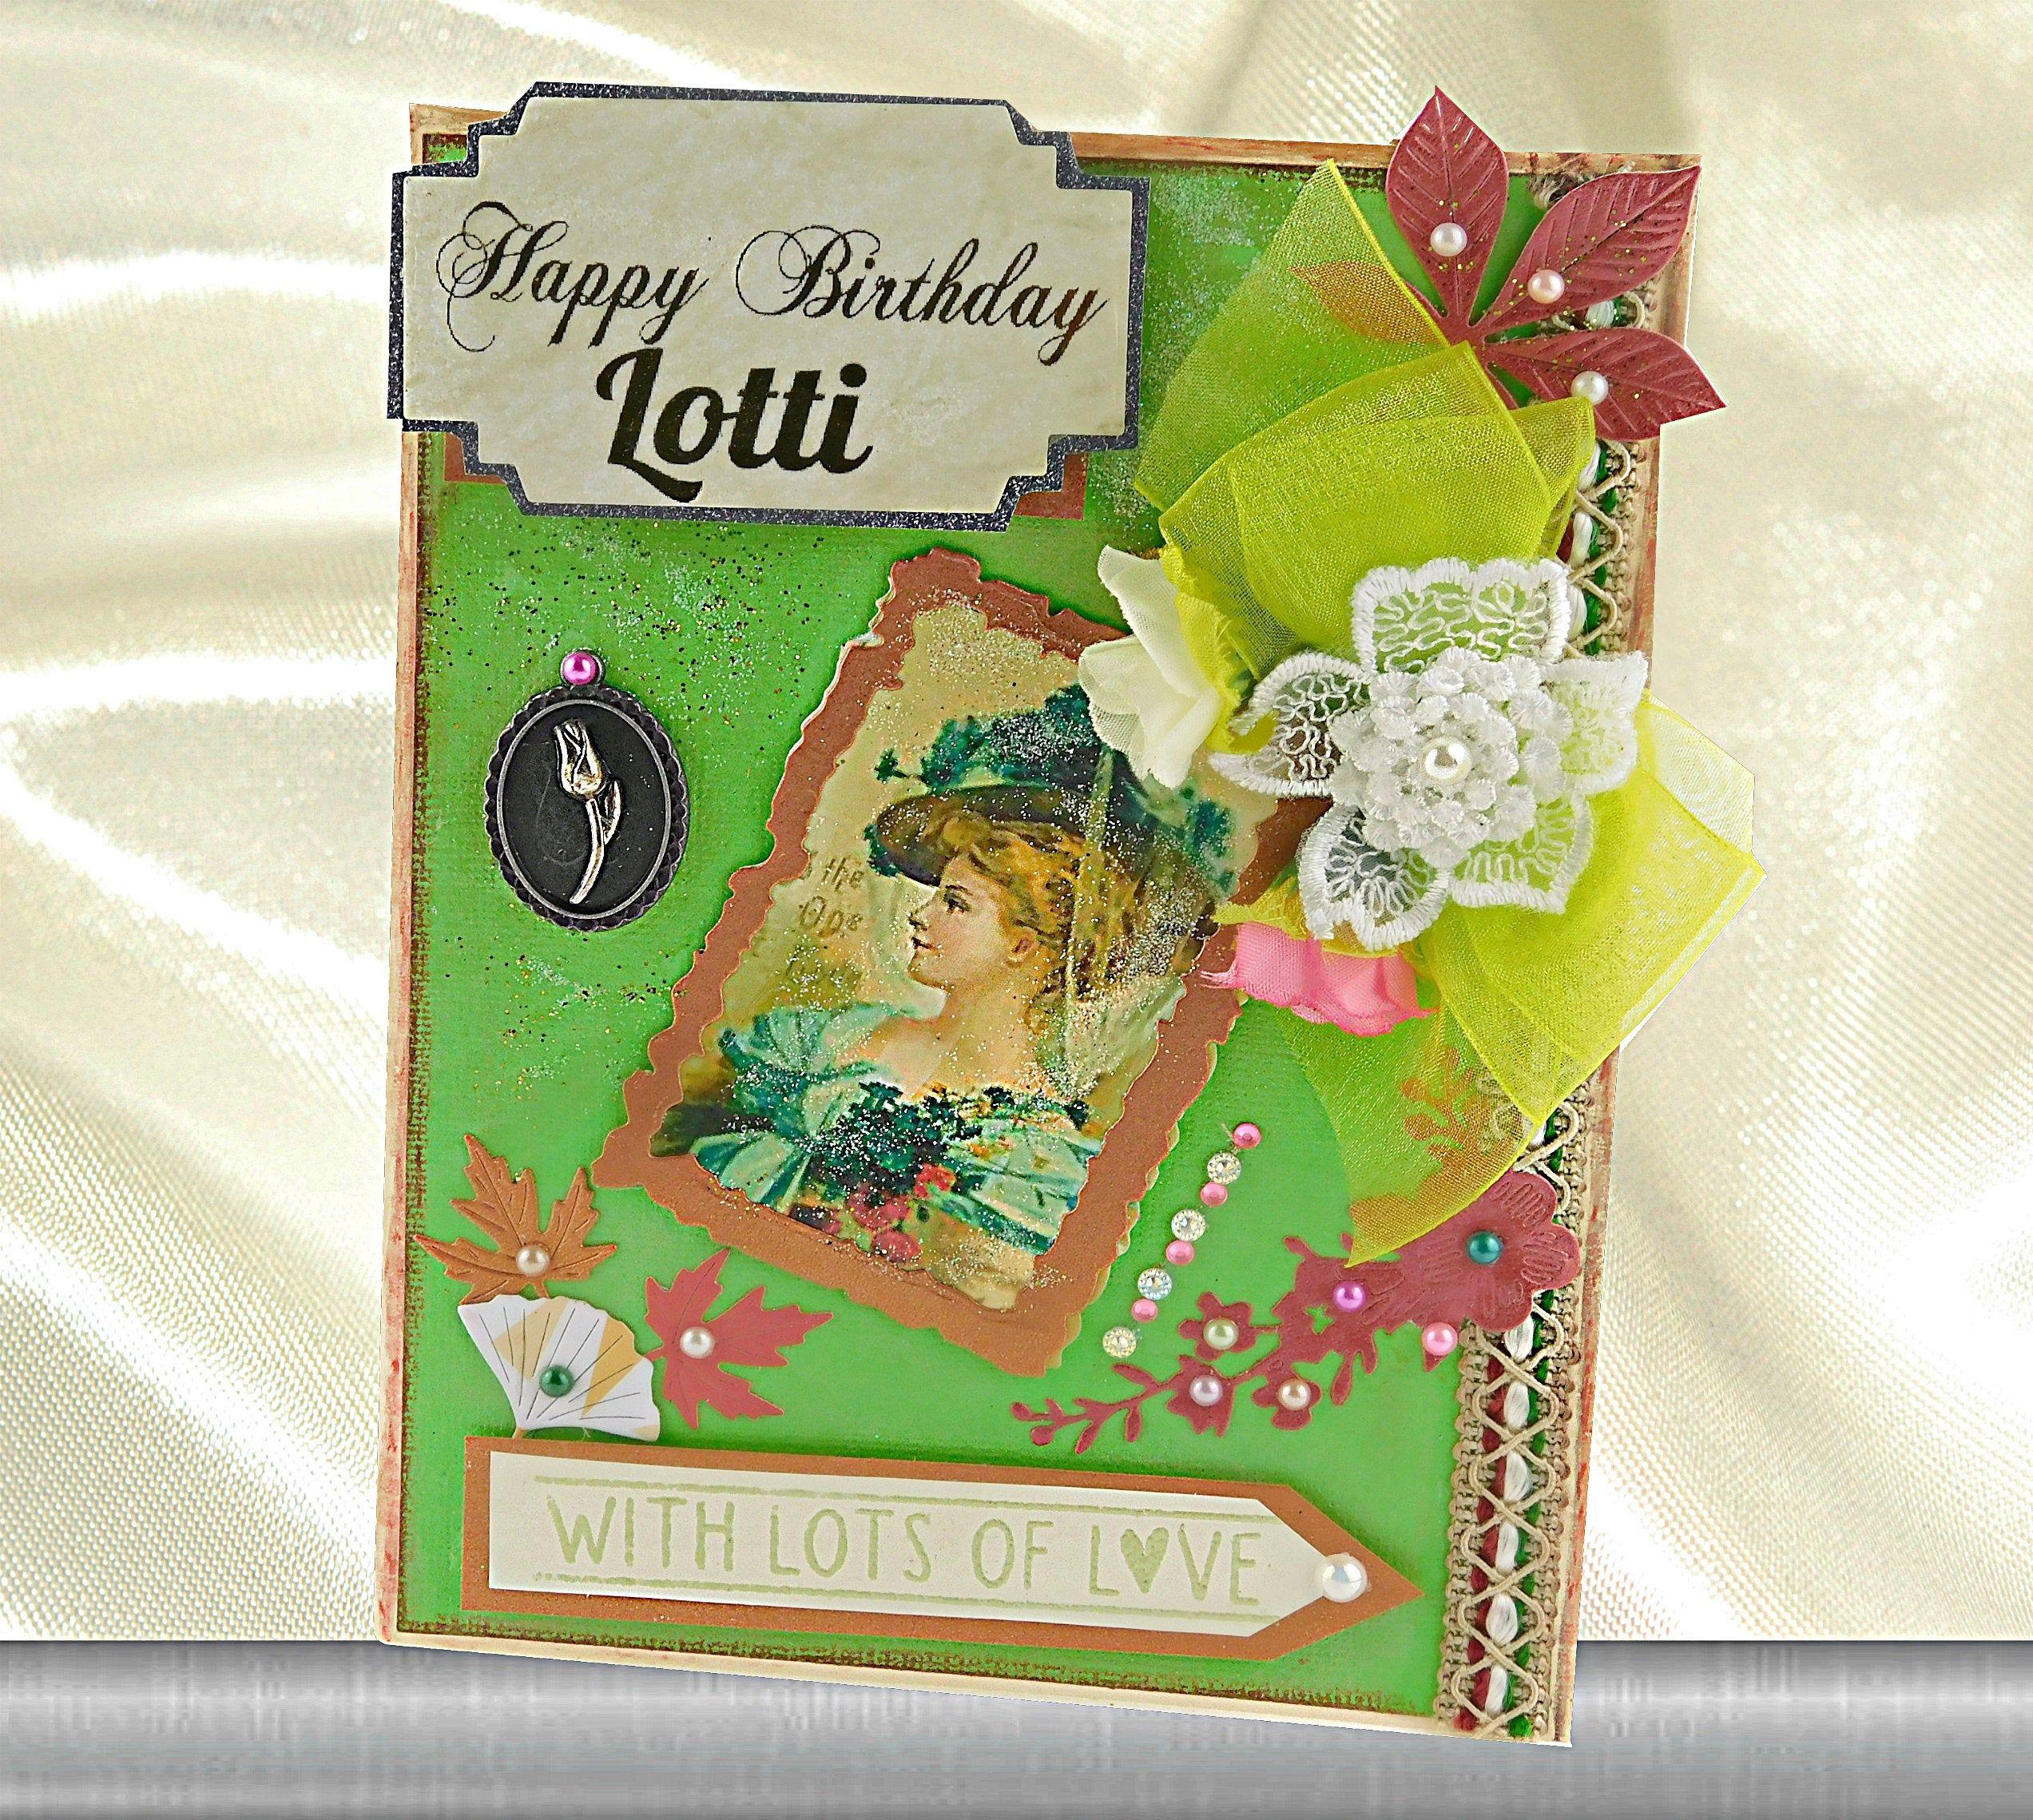 Handmade Boxed Card Card For Mom 40th Birthday Card 50th Etsy 60th Birthday Cards 40th Birthday Cards 50th Birthday Cards